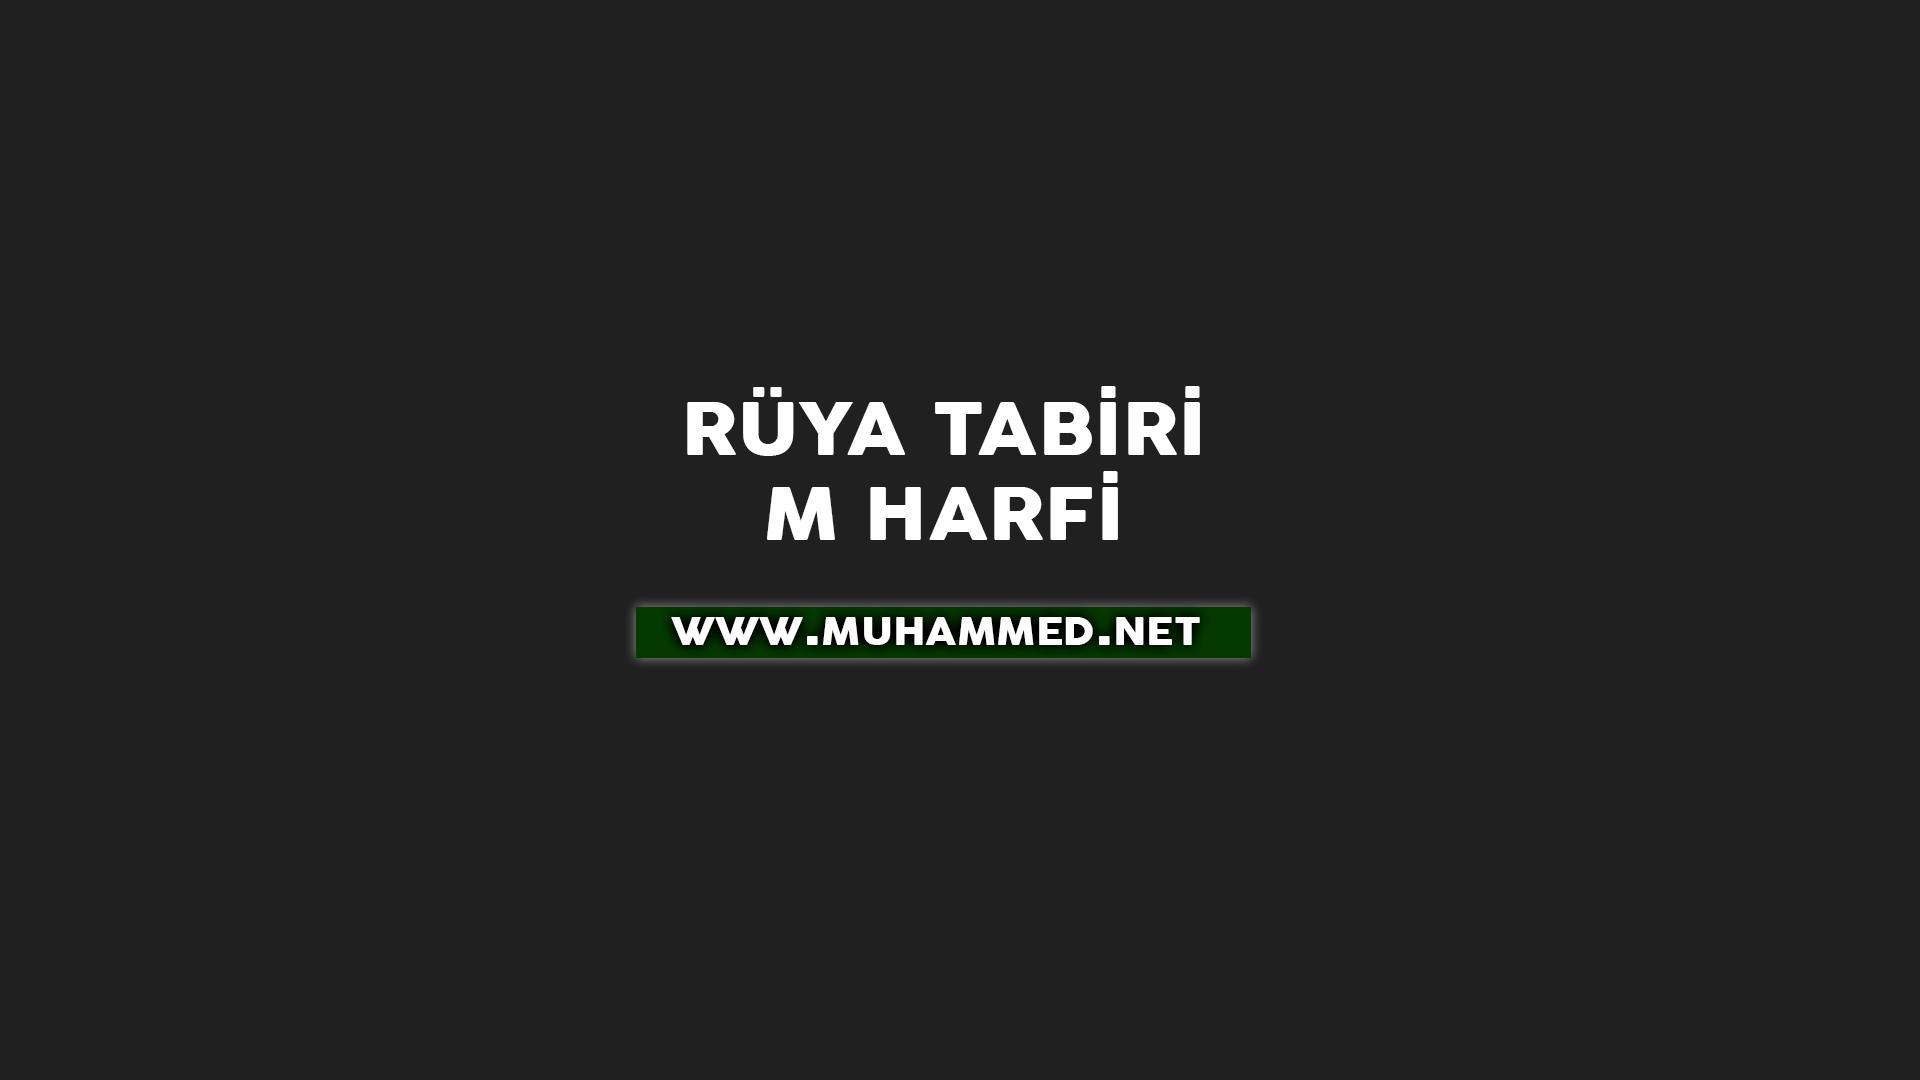 Rüya Tabiri - M Harfi